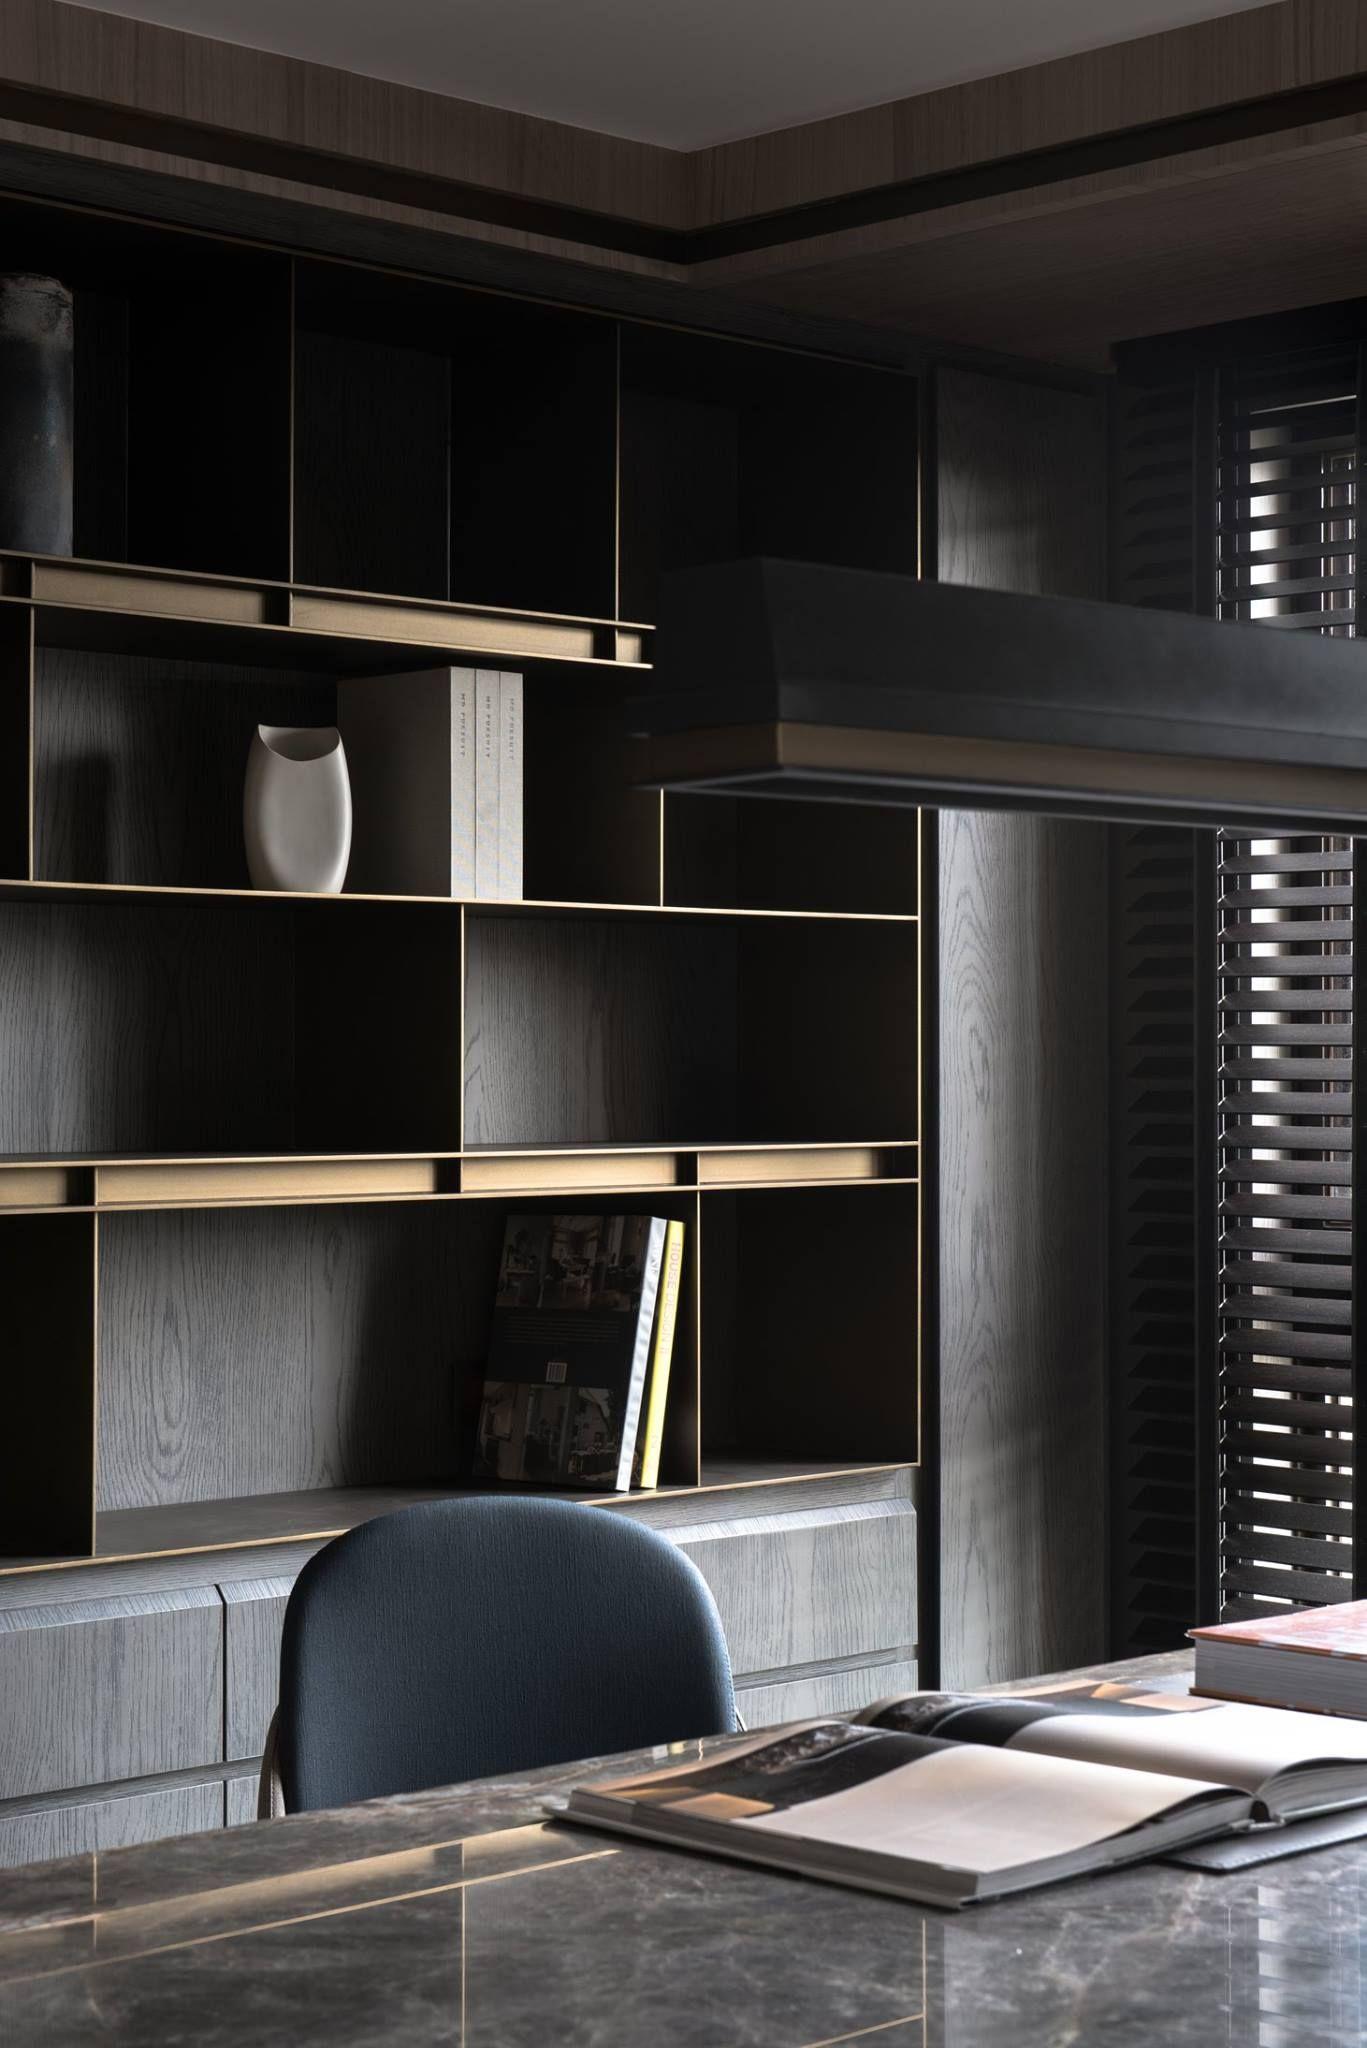 Study Room Interior Design: 8a776115725edd56593ba085232d5c75.jpg (1367×2048)